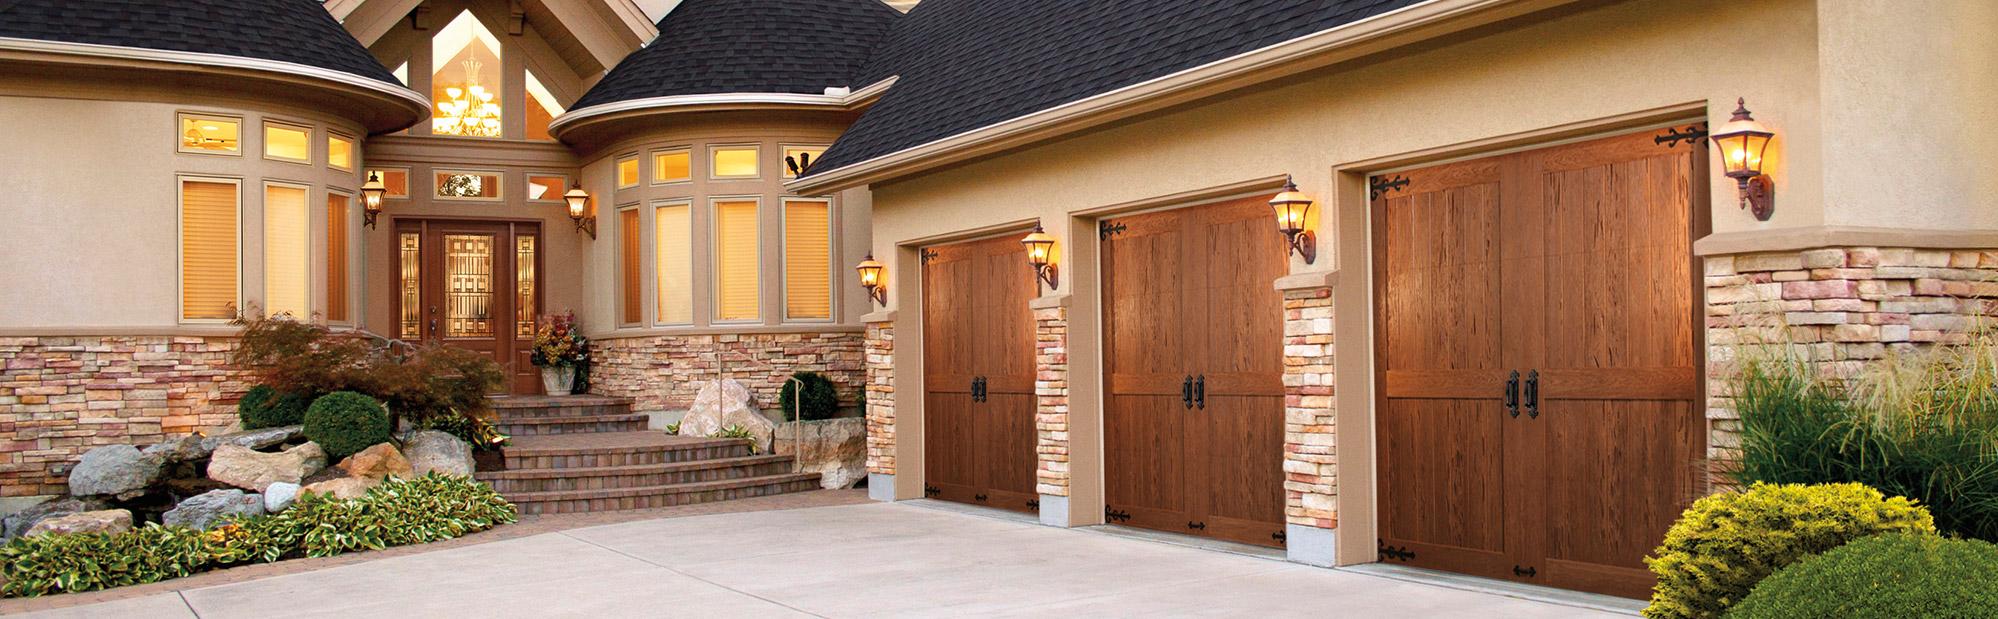 clopay reviewsclopay ideas florida reviews of branch orlando doors reviewsbranch large marvelous garage fl size